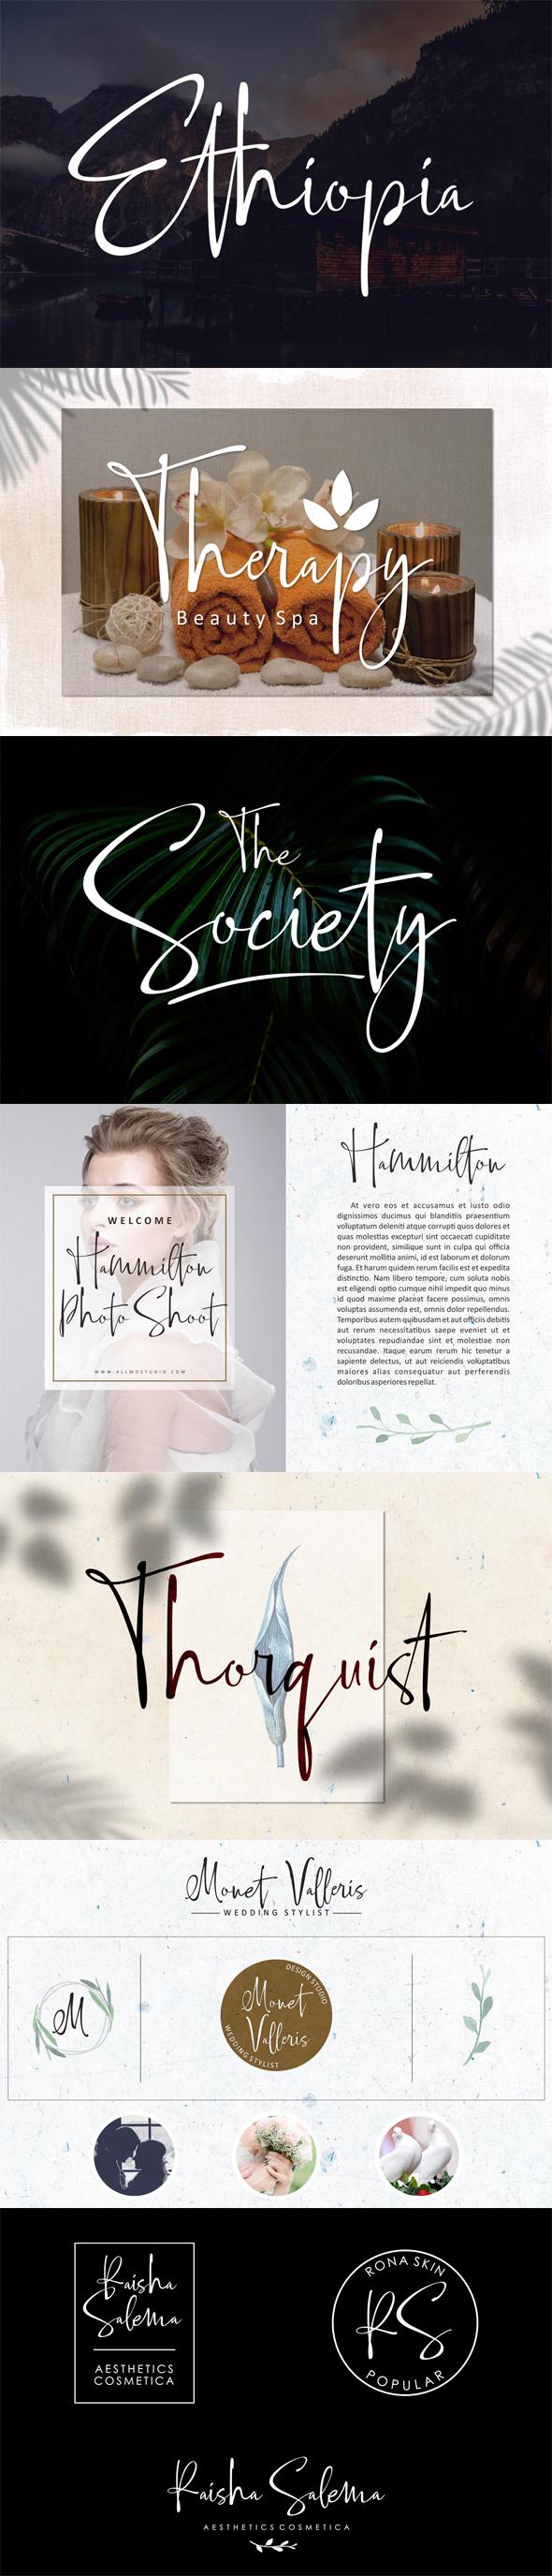 calligraphy font Script Font Girly sweet Font Romantic elegant branding  Mockup wedding logo